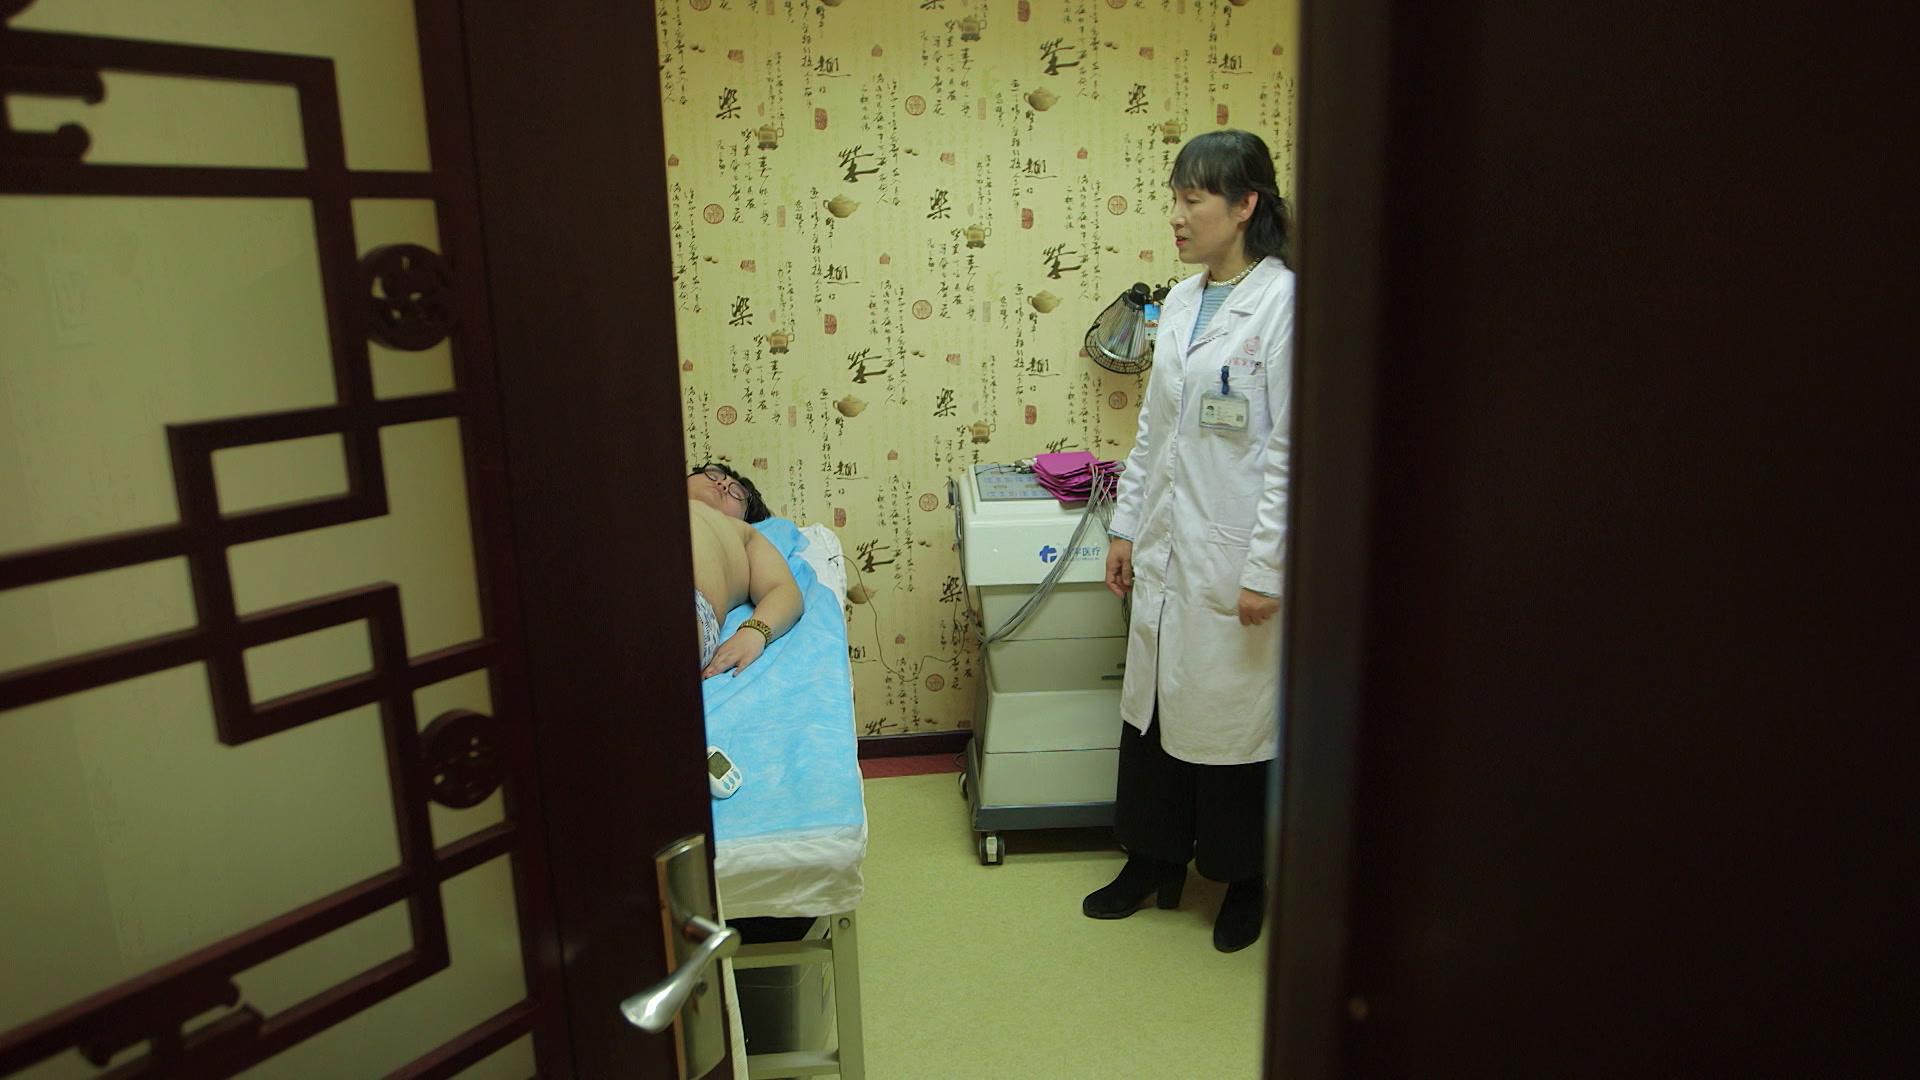 mayn_c_udland_china_overweight-00.02.20.02.jpg